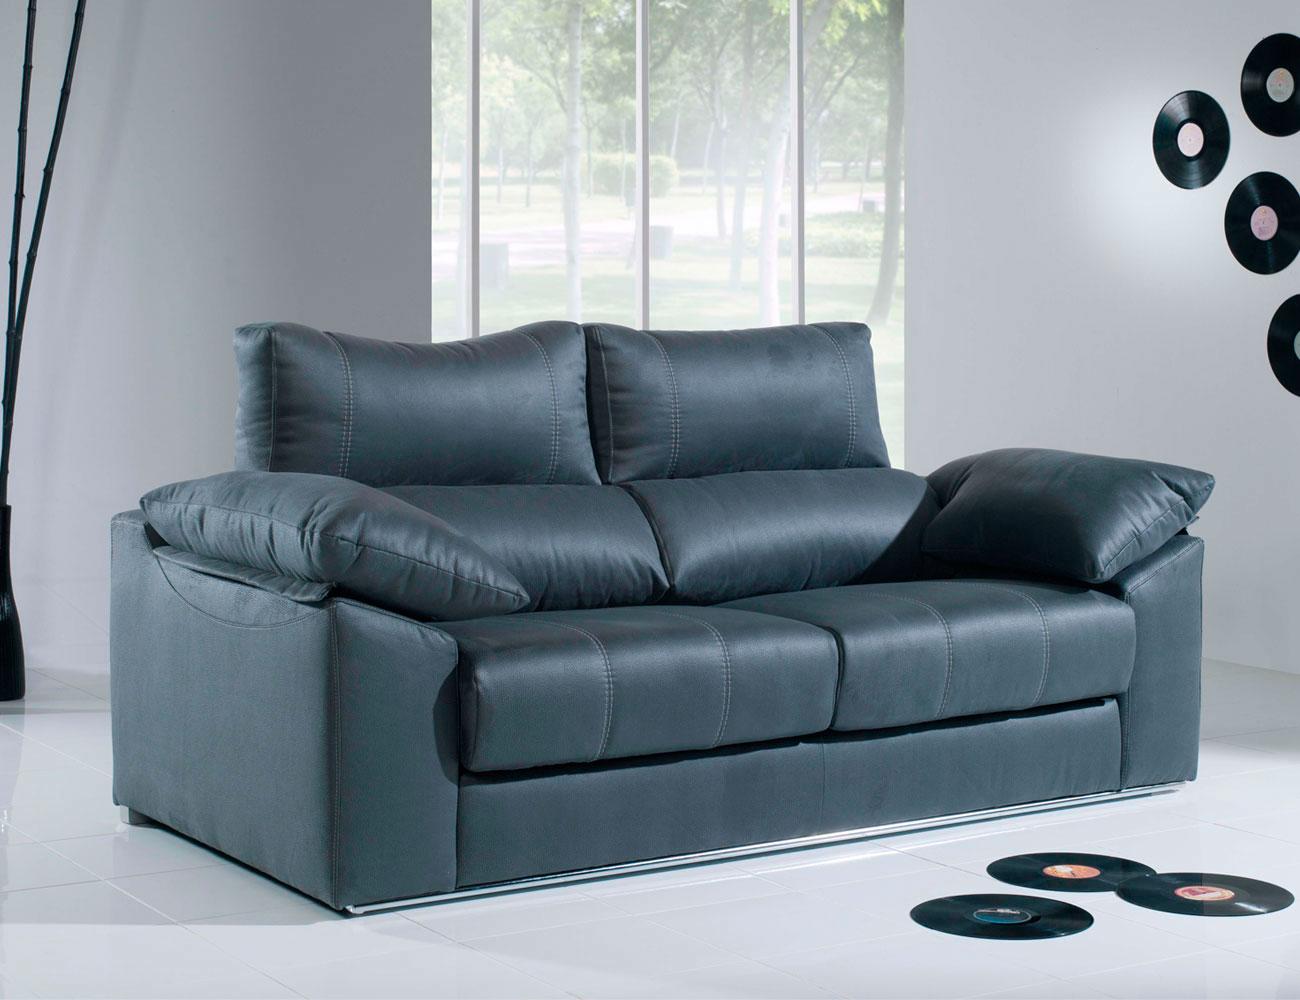 Sofa 3 plazas anti manchas asientos extraibles